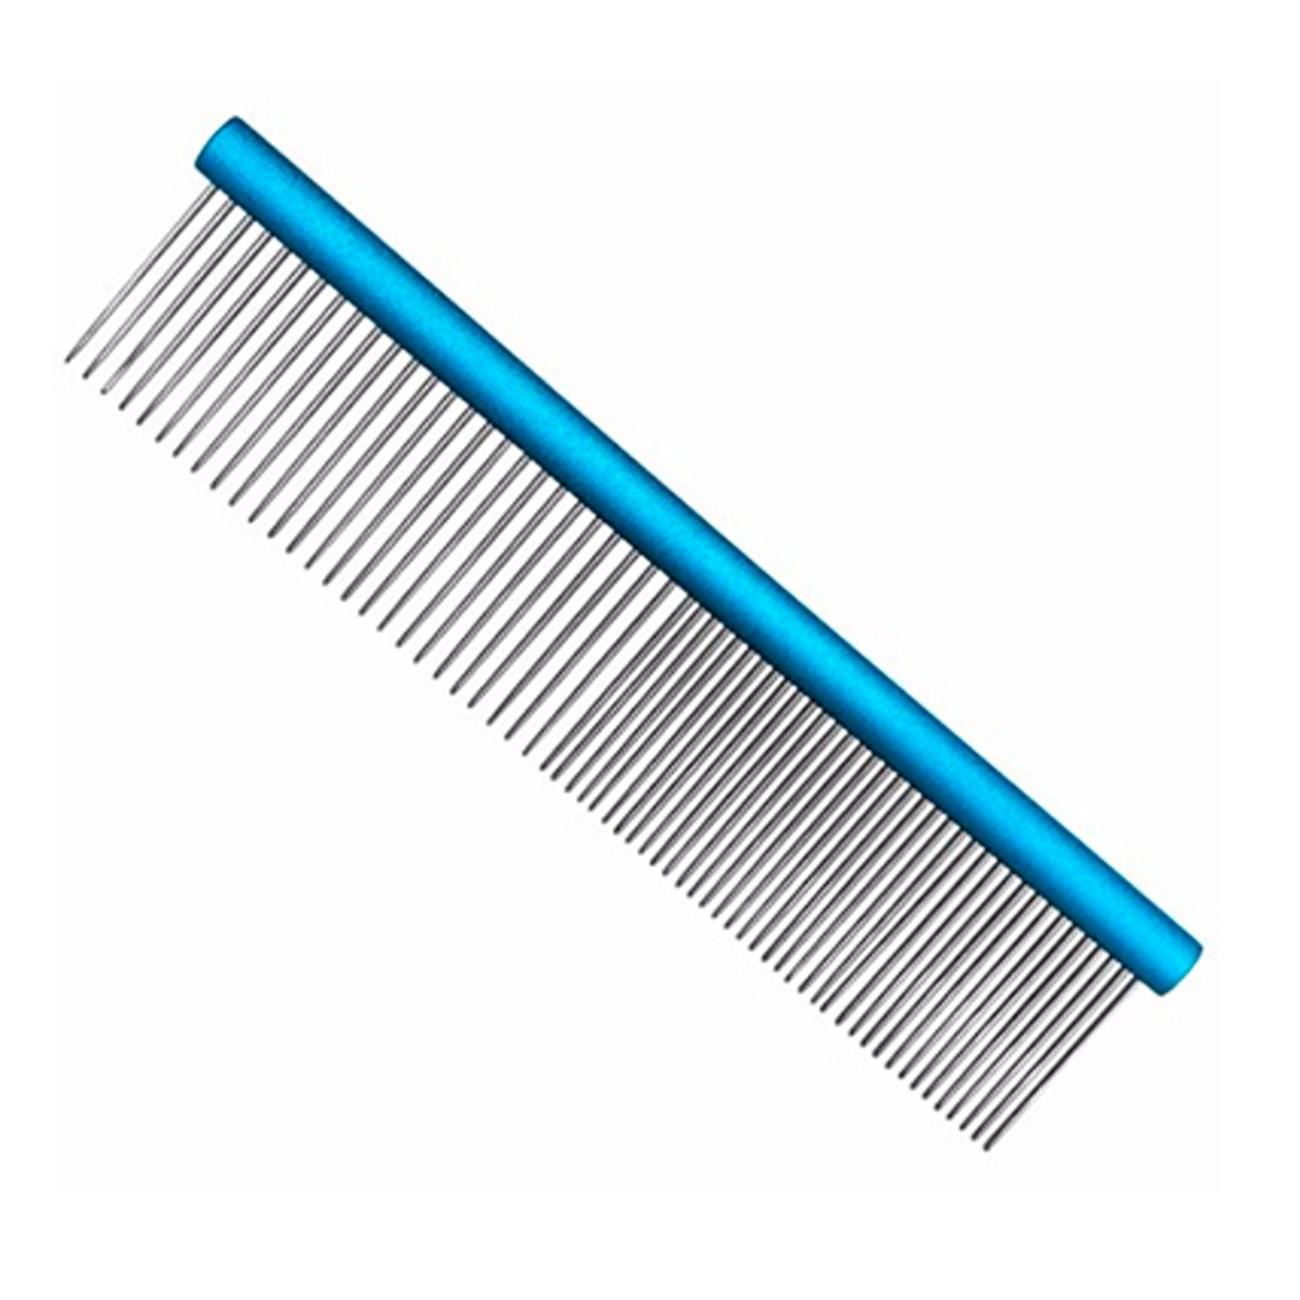 Pente 30cm Duplo Alumínio Azul Precision Edge